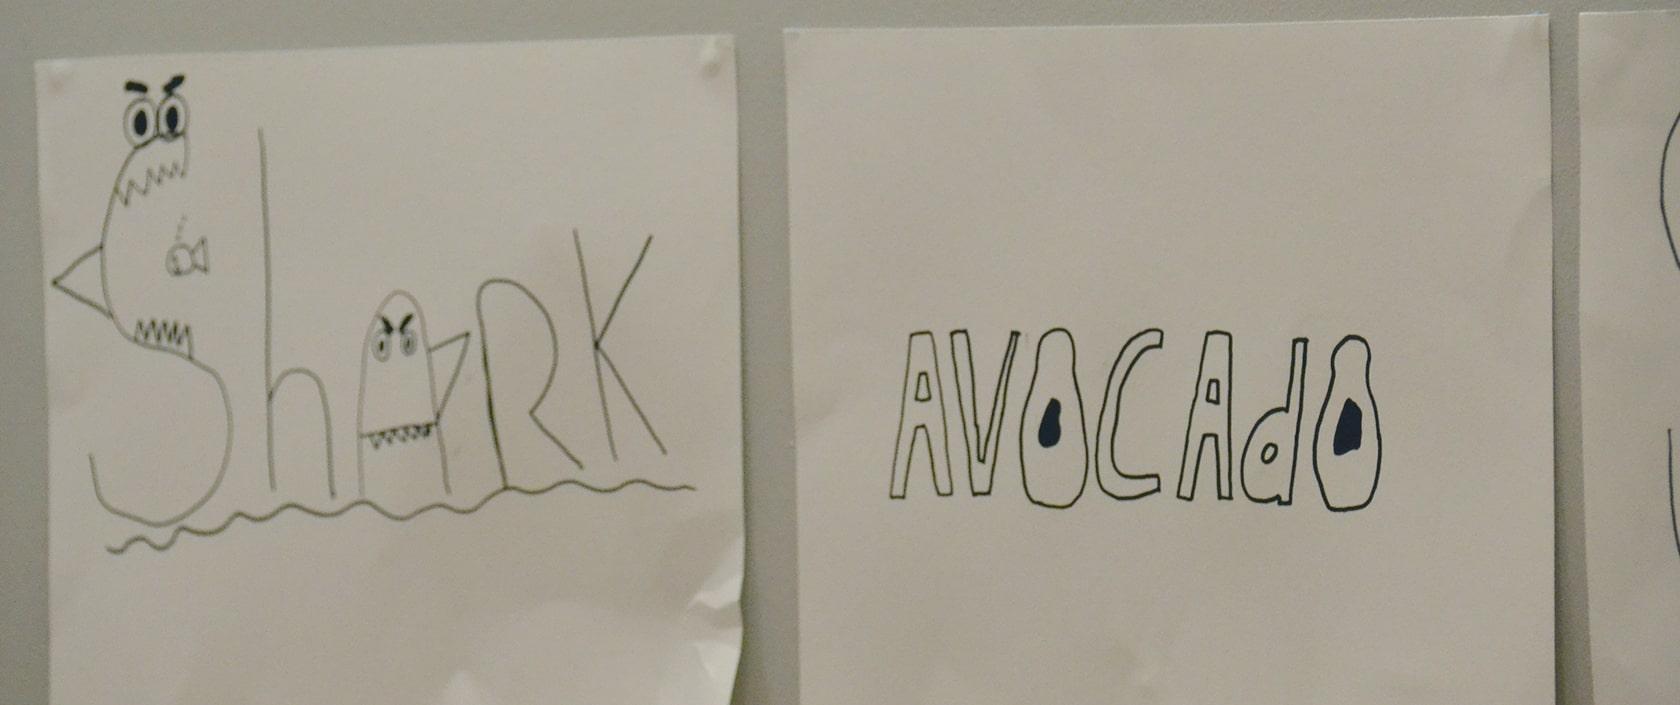 04-AR-Week1_Lesson-Image-Banner-min.jpg